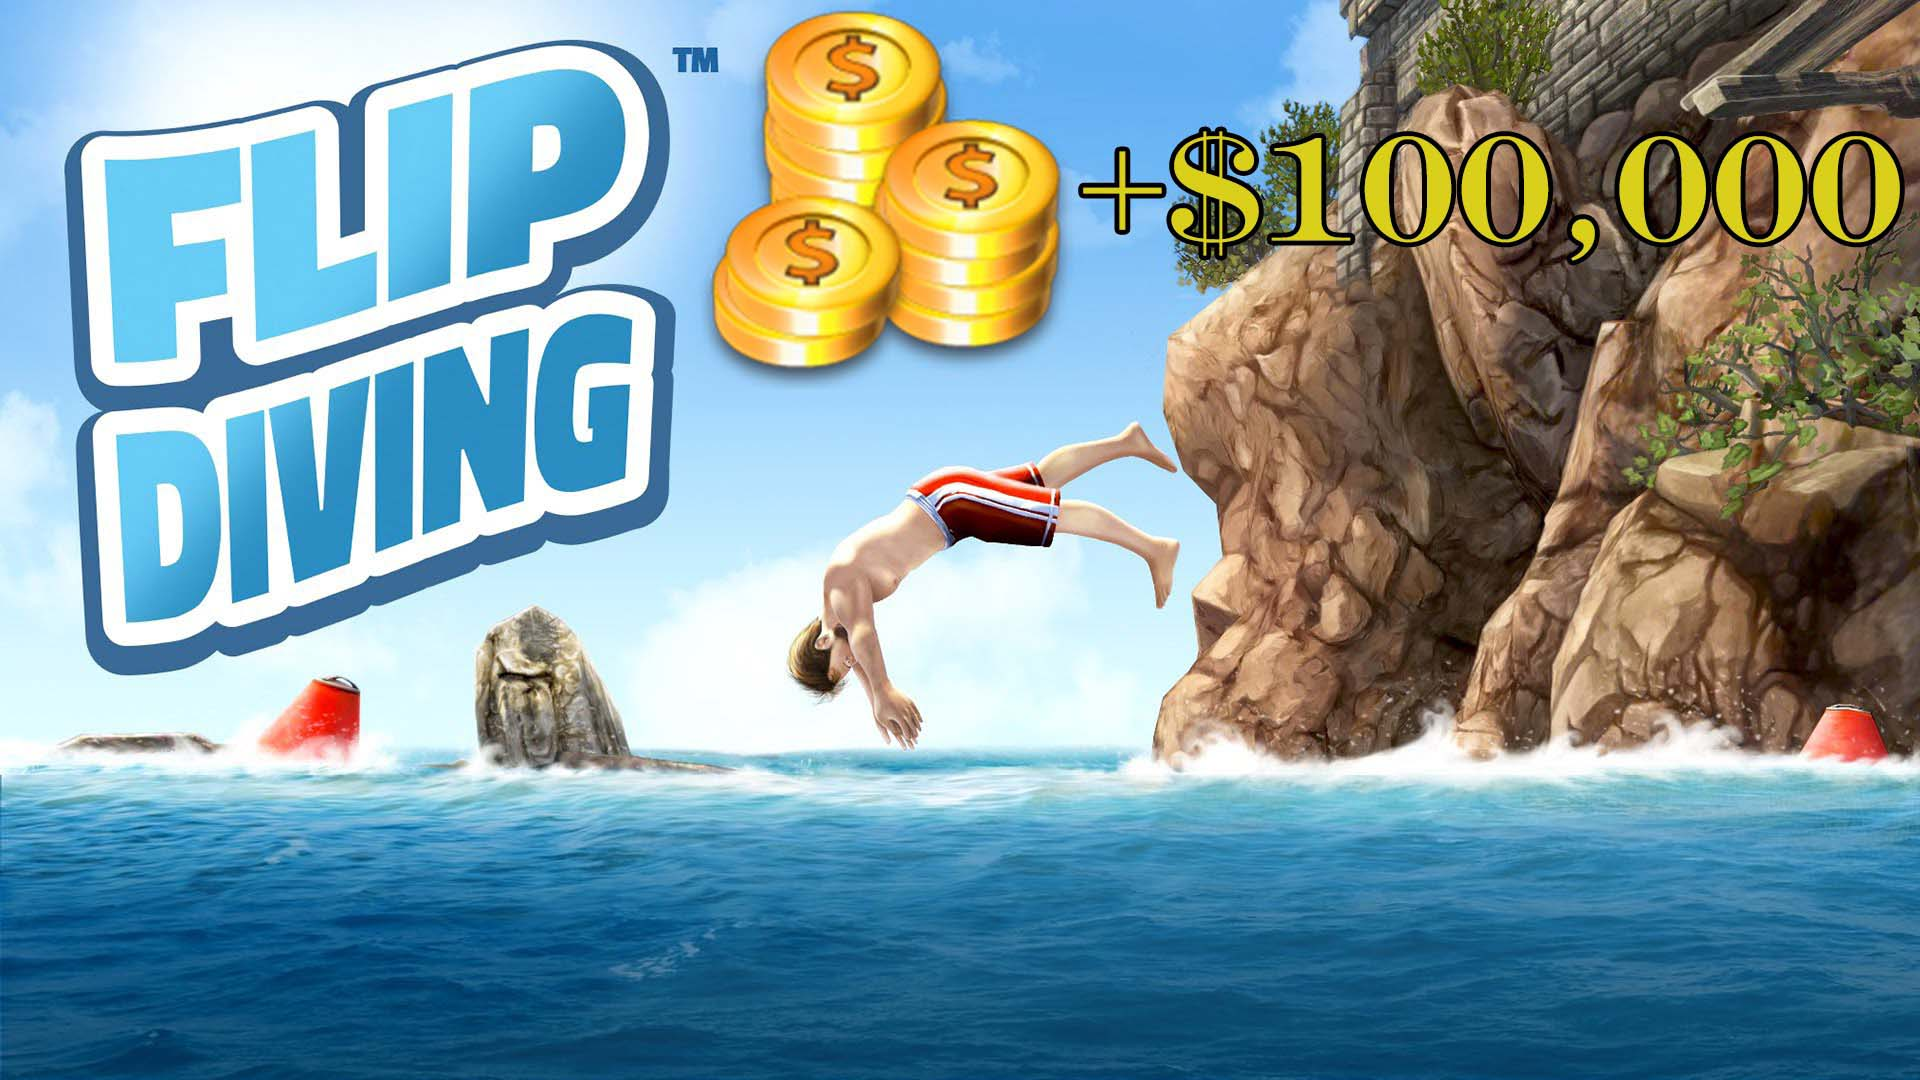 Trucchi Flip Diving: 5000 monete per tuffo (soldi infiniti)